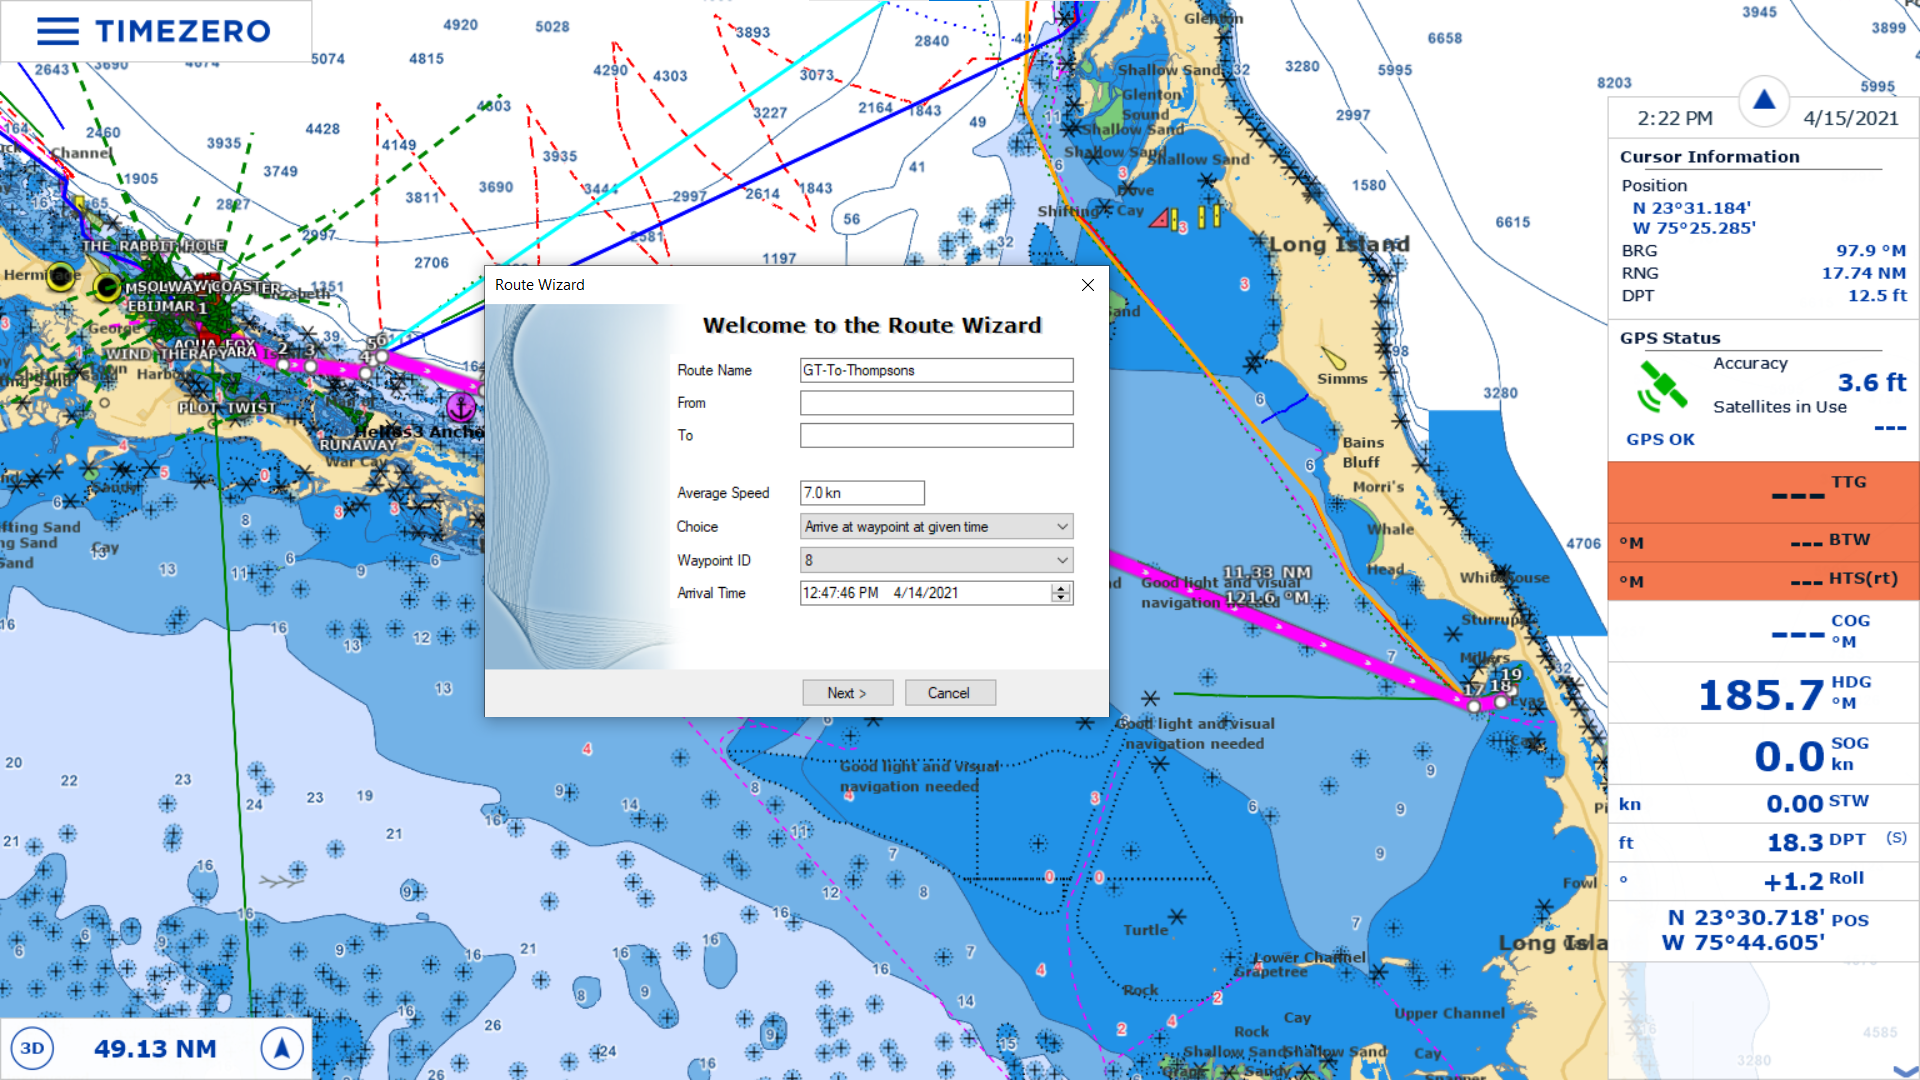 The route planning wizard in TimeZero